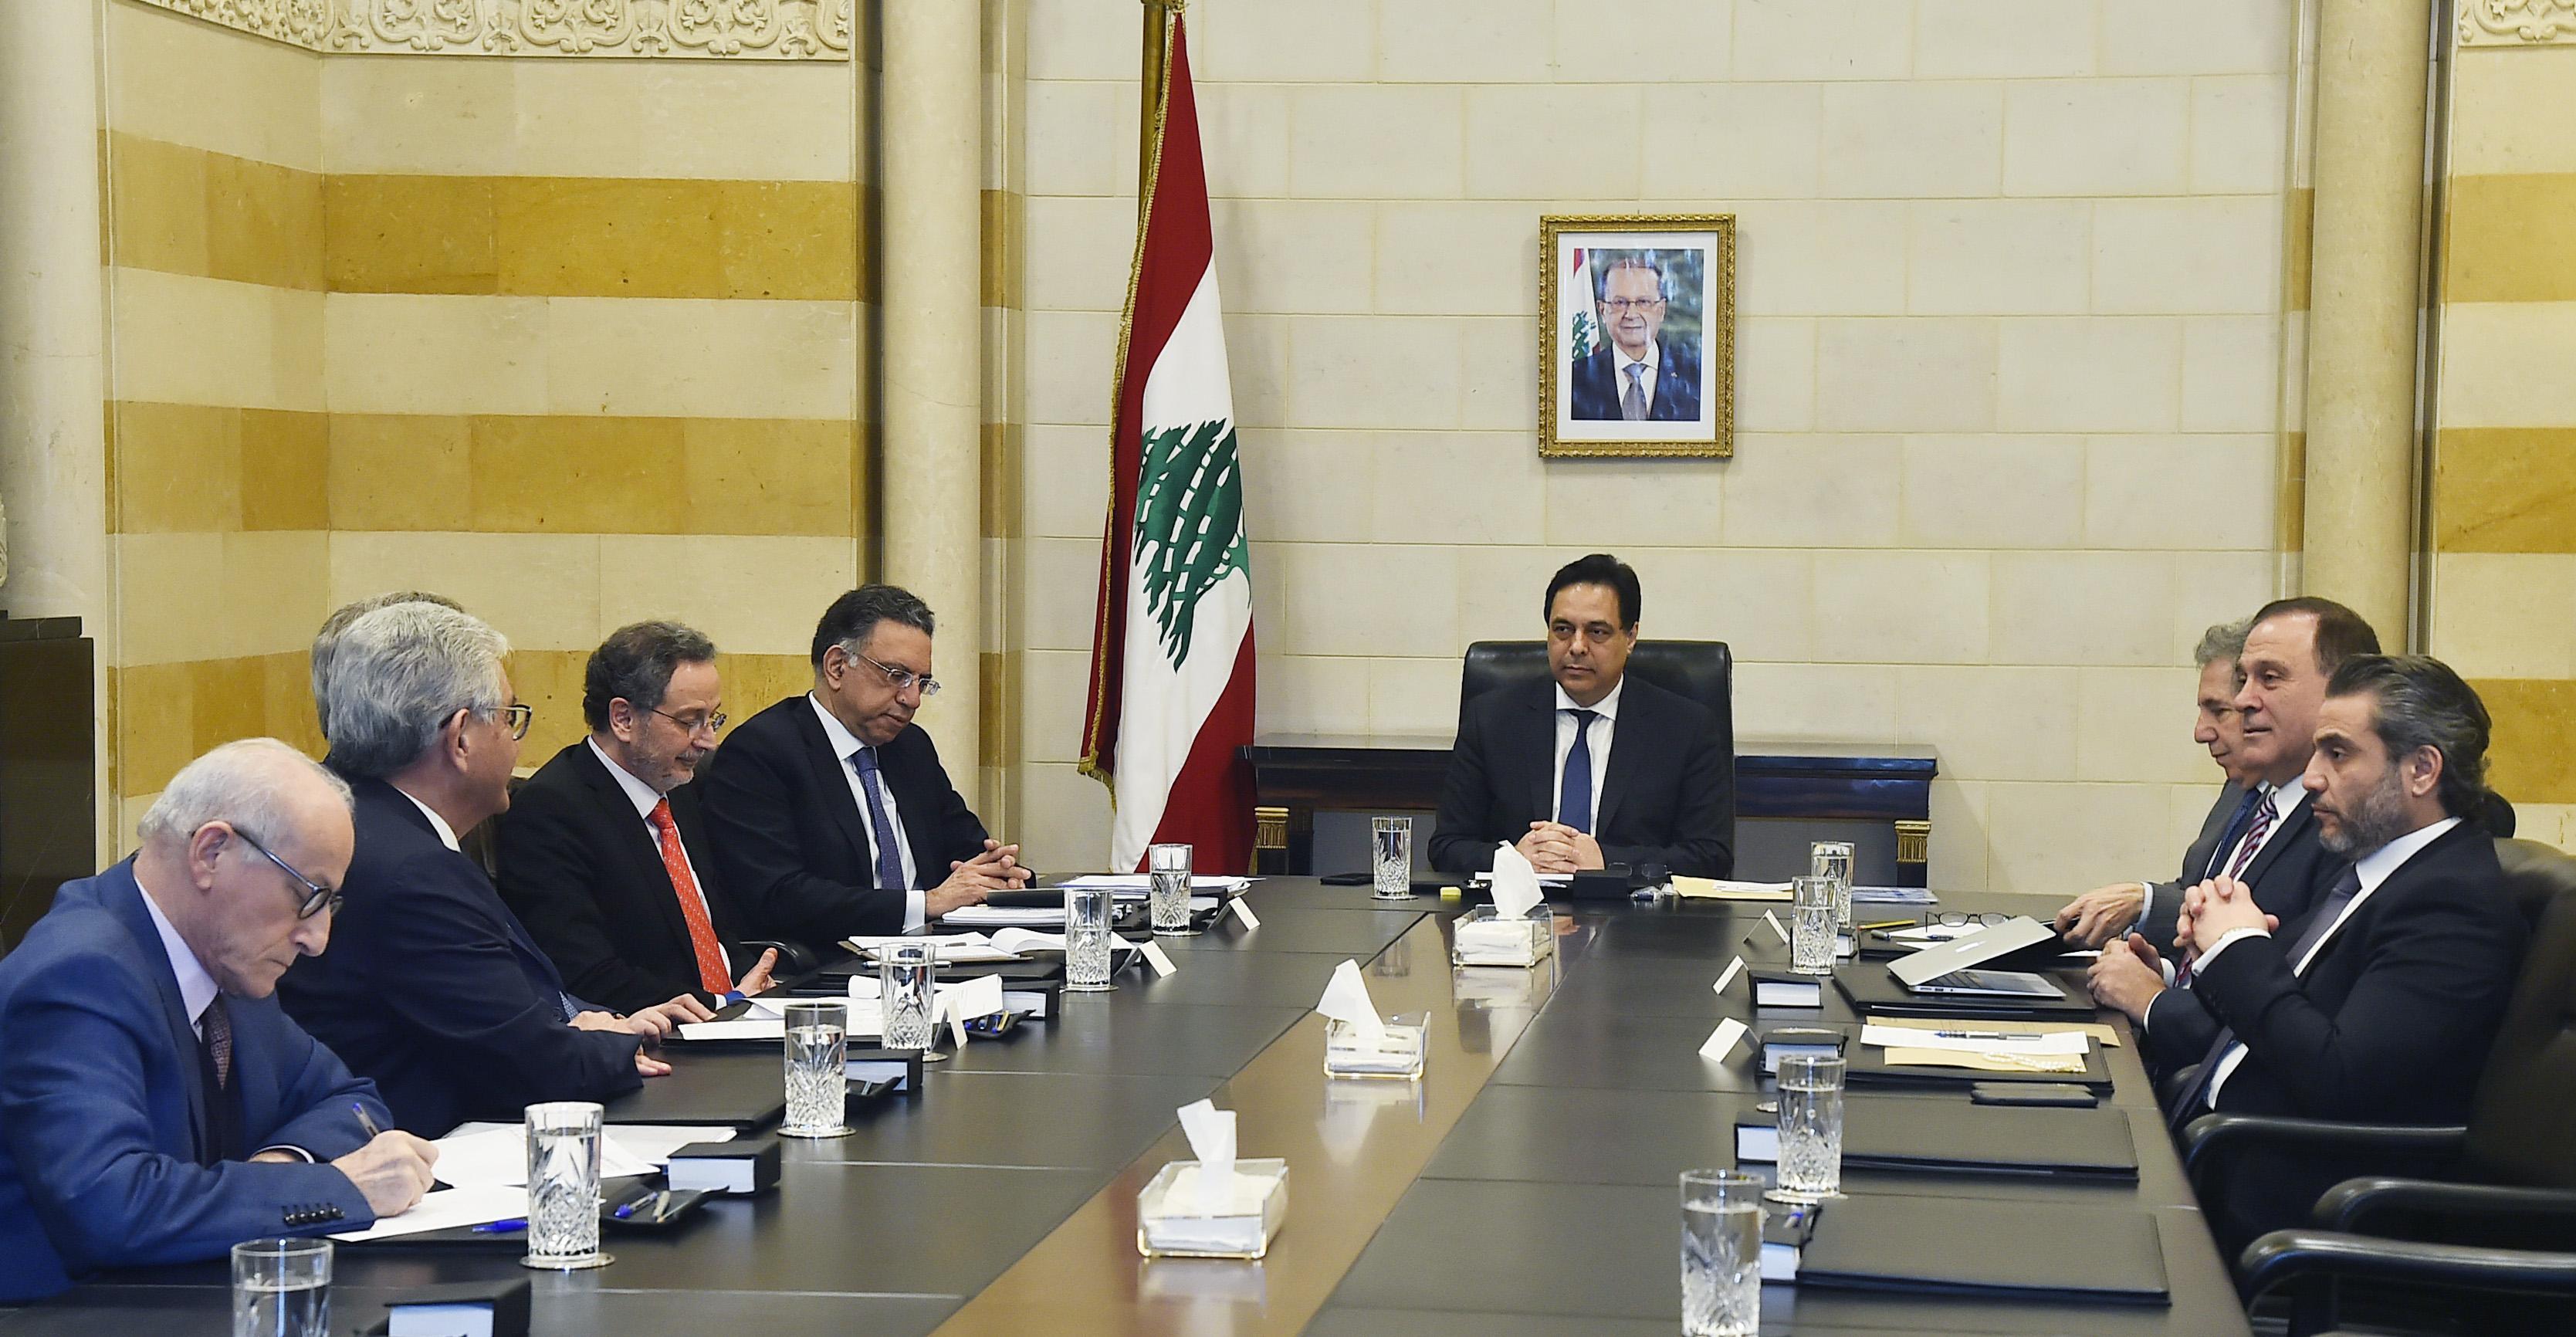 Pr Minister Hassan Diab meets Heading a Economics Meetings